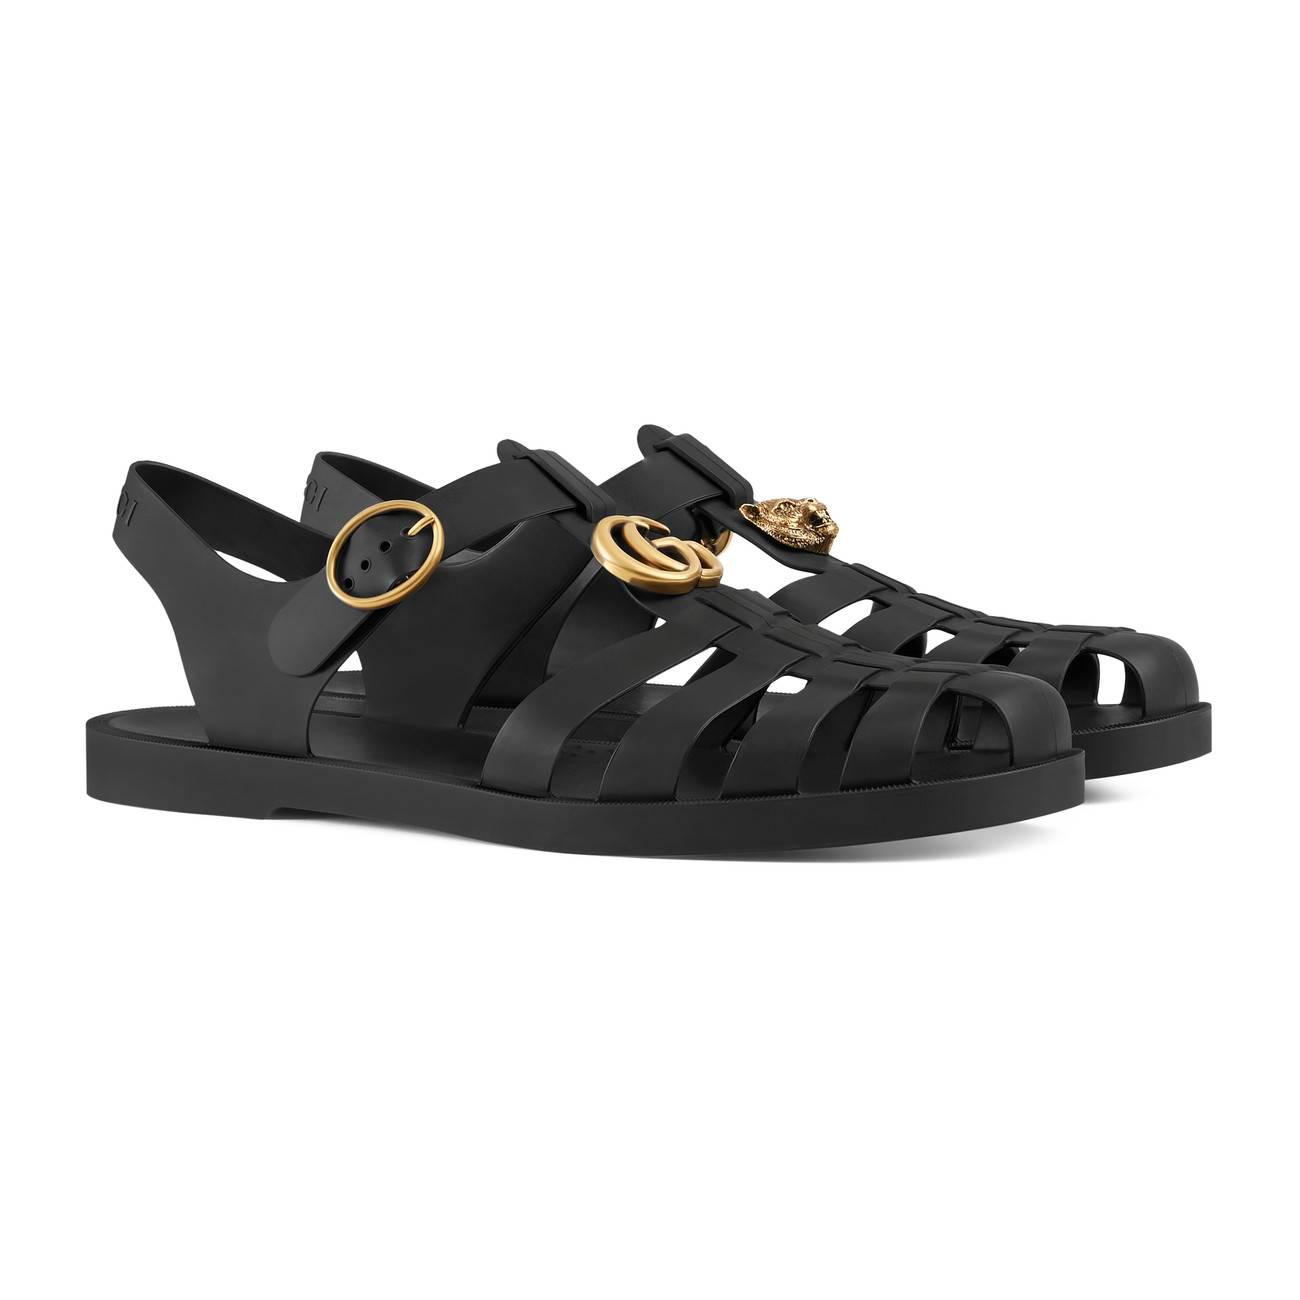 e24da1681 Gucci - Black Rubber Buckle Strap Sandal for Men - Lyst. View fullscreen